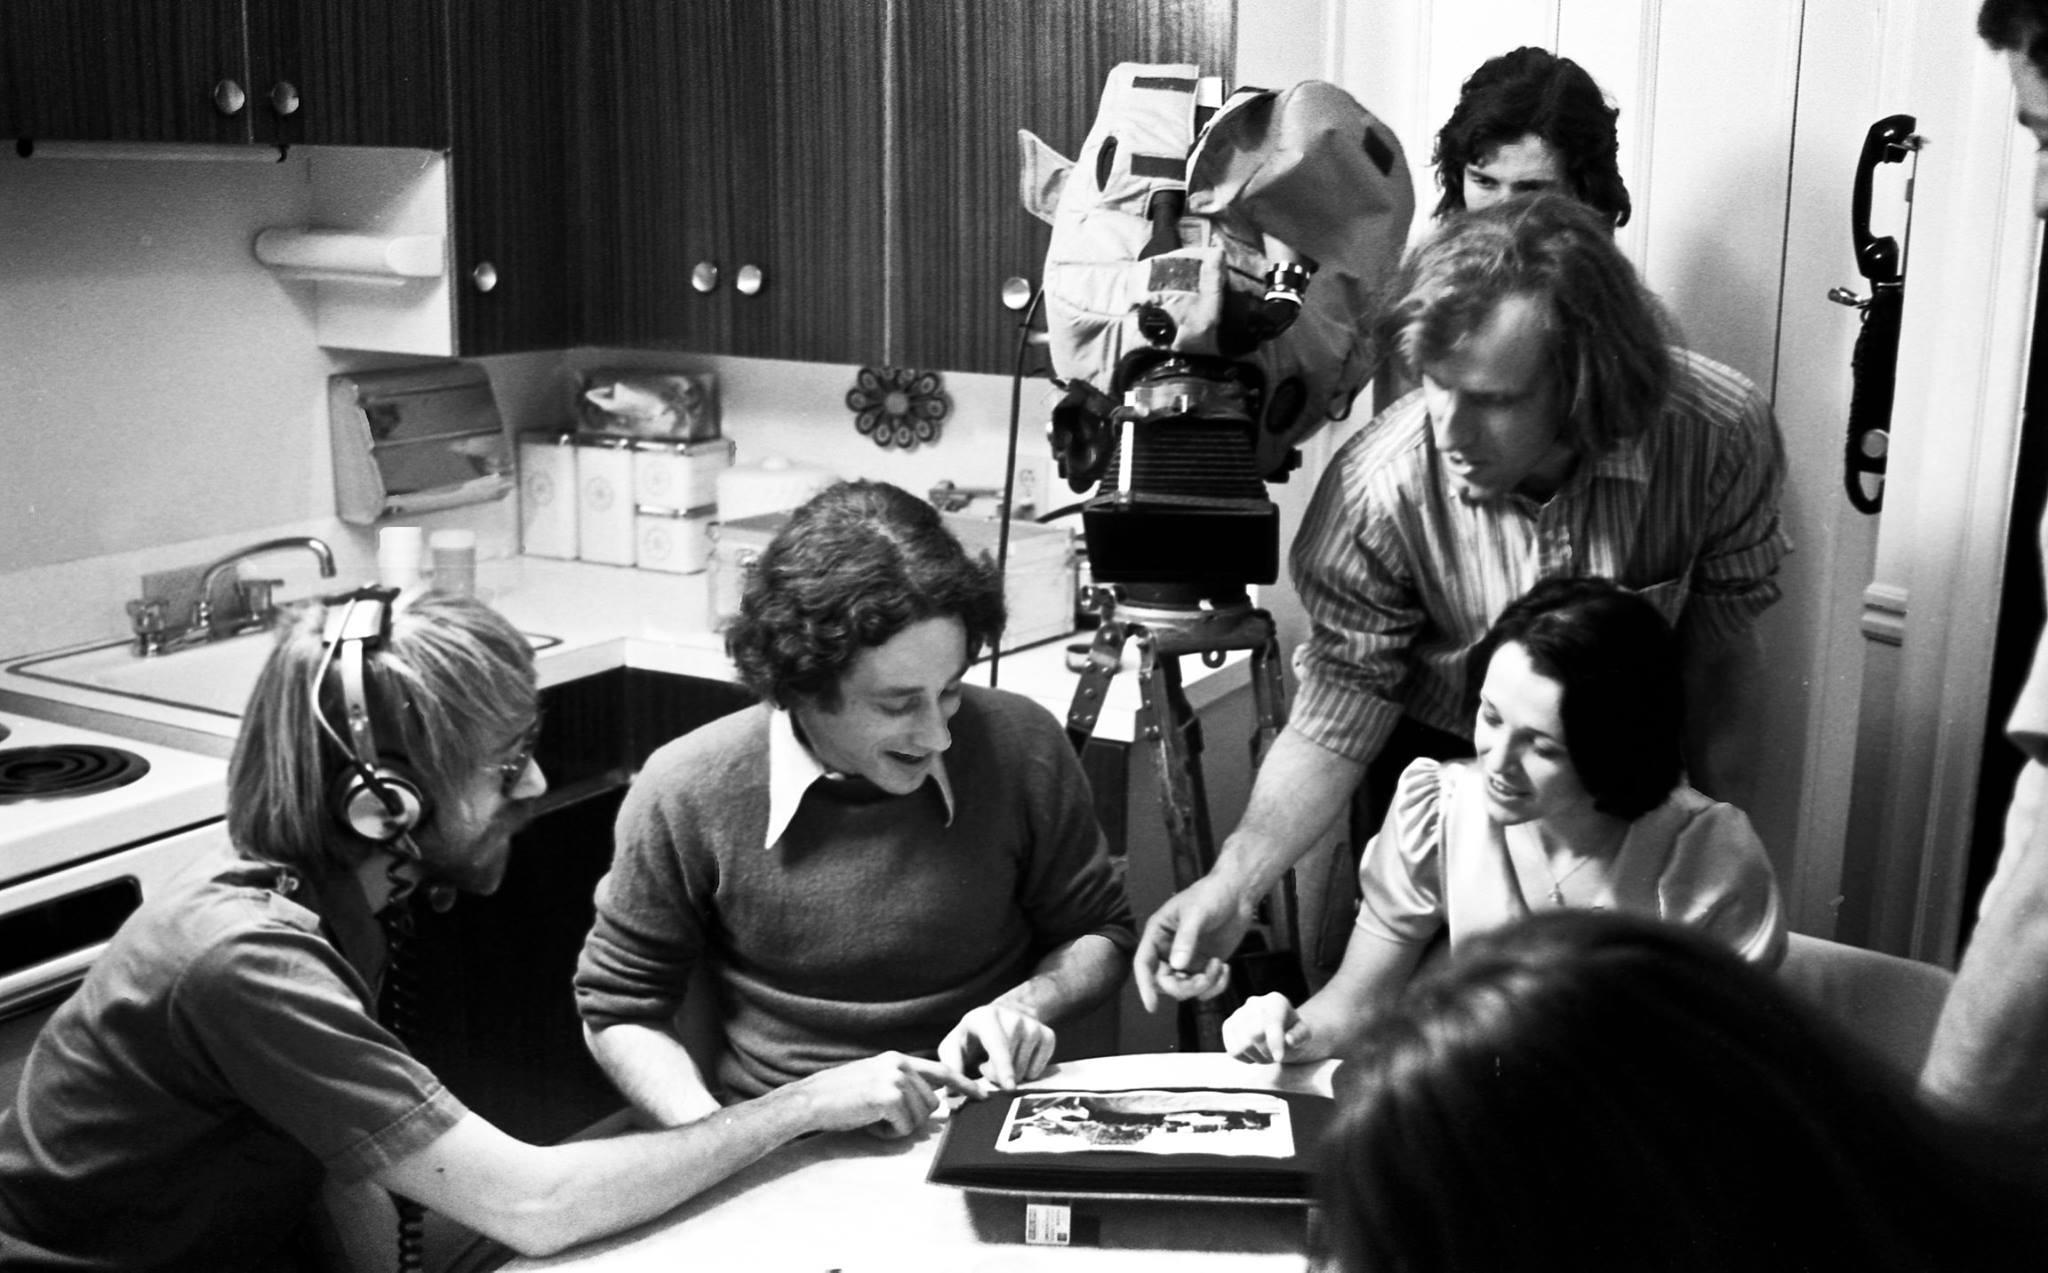 Ann Davies (born 1934),Marie Wilson (American actress) Hot pics & movies Alison Glennie,Rob Ostlere